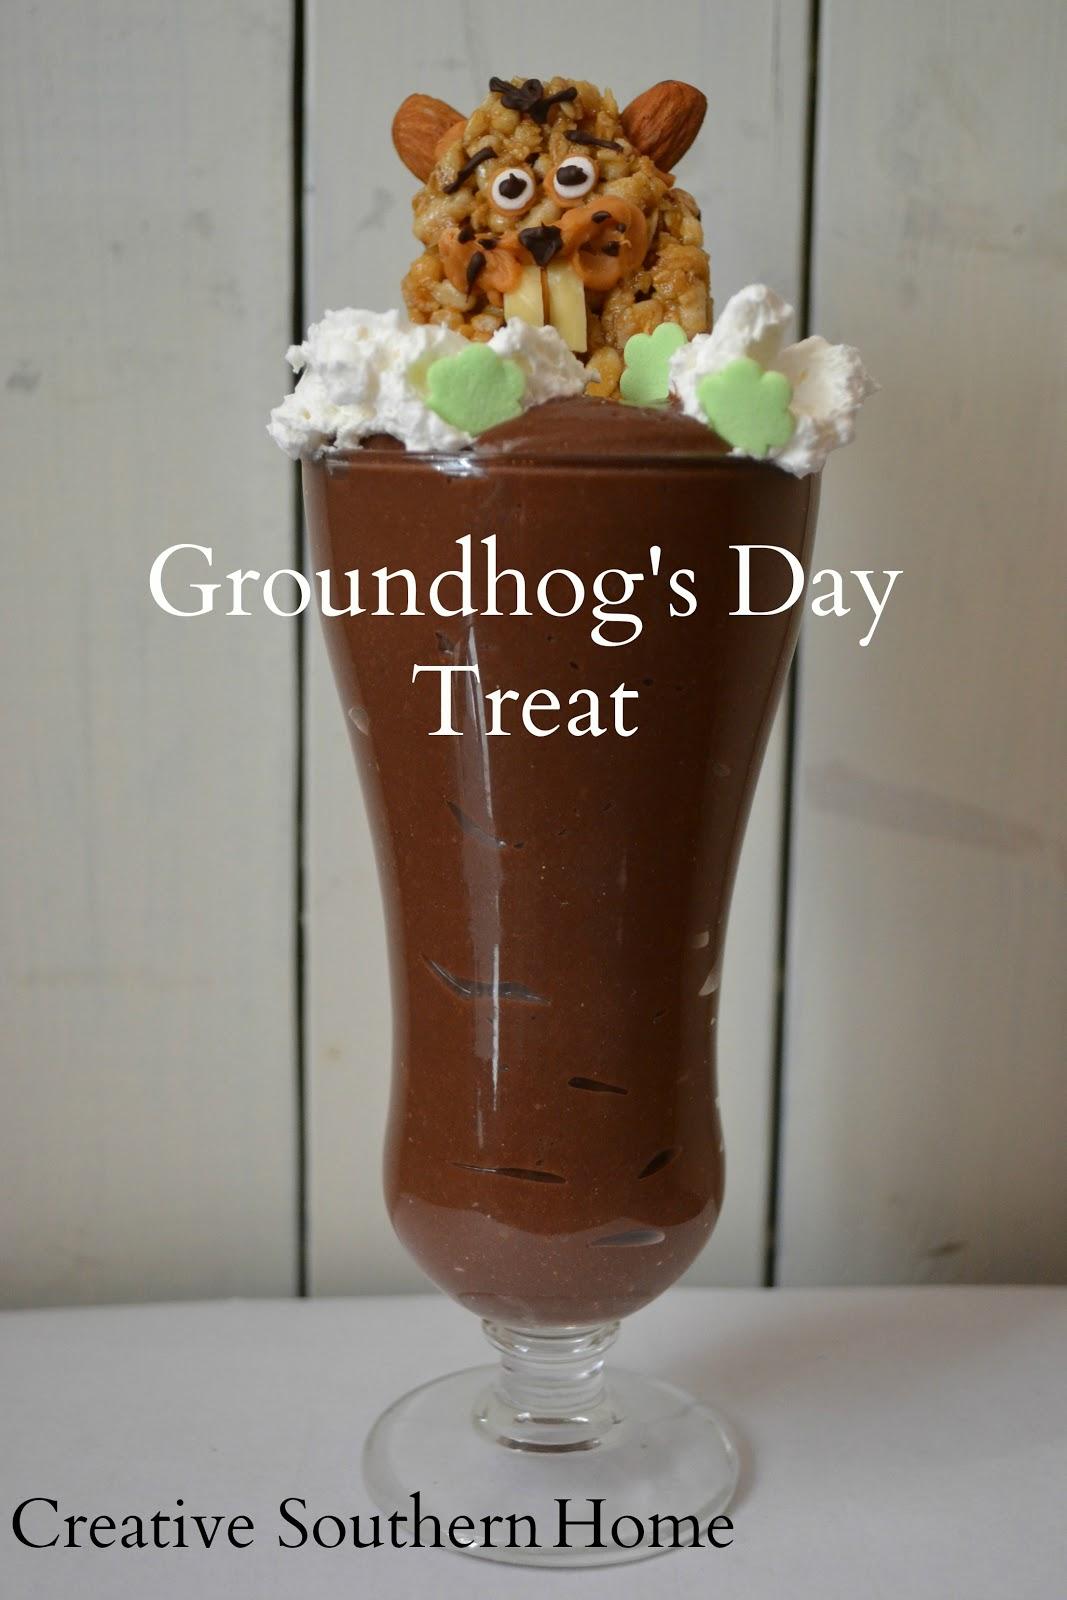 Groundhog's Day Treat